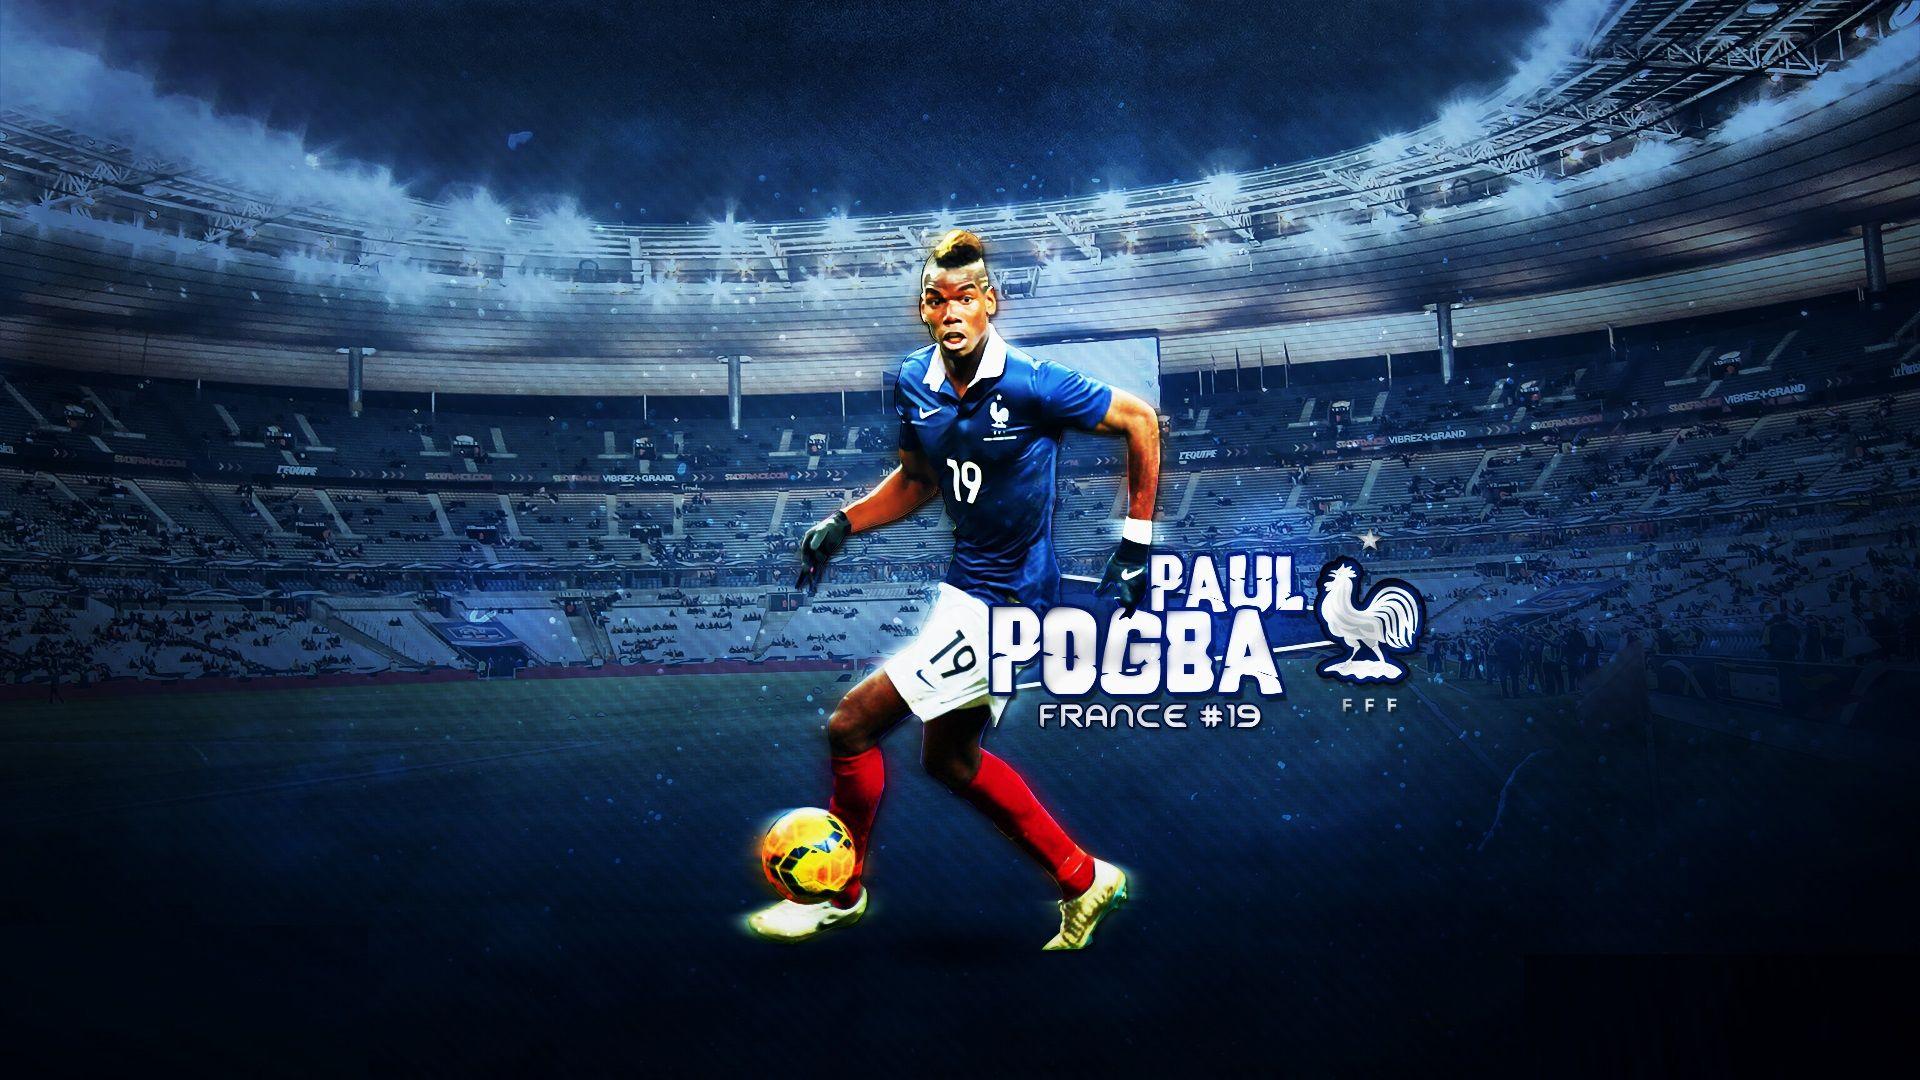 Awesome Paul Pogba Wallpaper Hd Paul Pogba Pogba France Paul